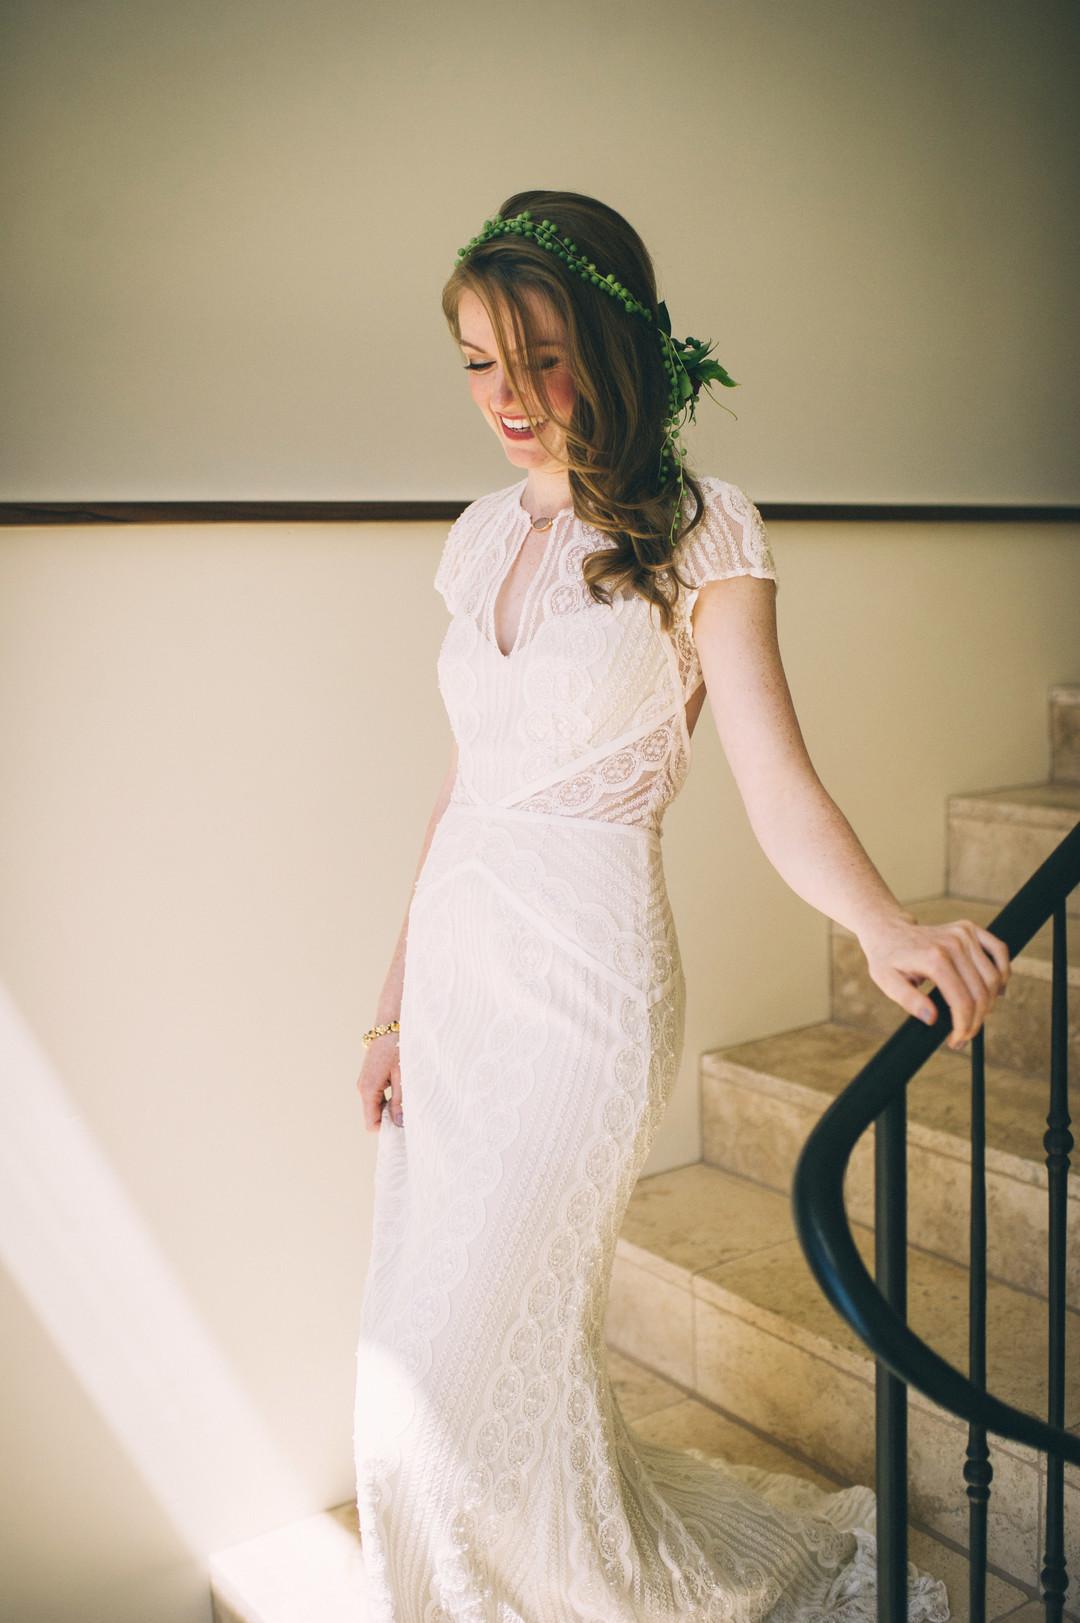 www.santabarbarawedding.com | Sarah Katherine Davis Photography | Santa Barbara Museum of Natural History | Wild Heart Events | BHLDN | Pretty Please Beauty | Bride Before Ceremony